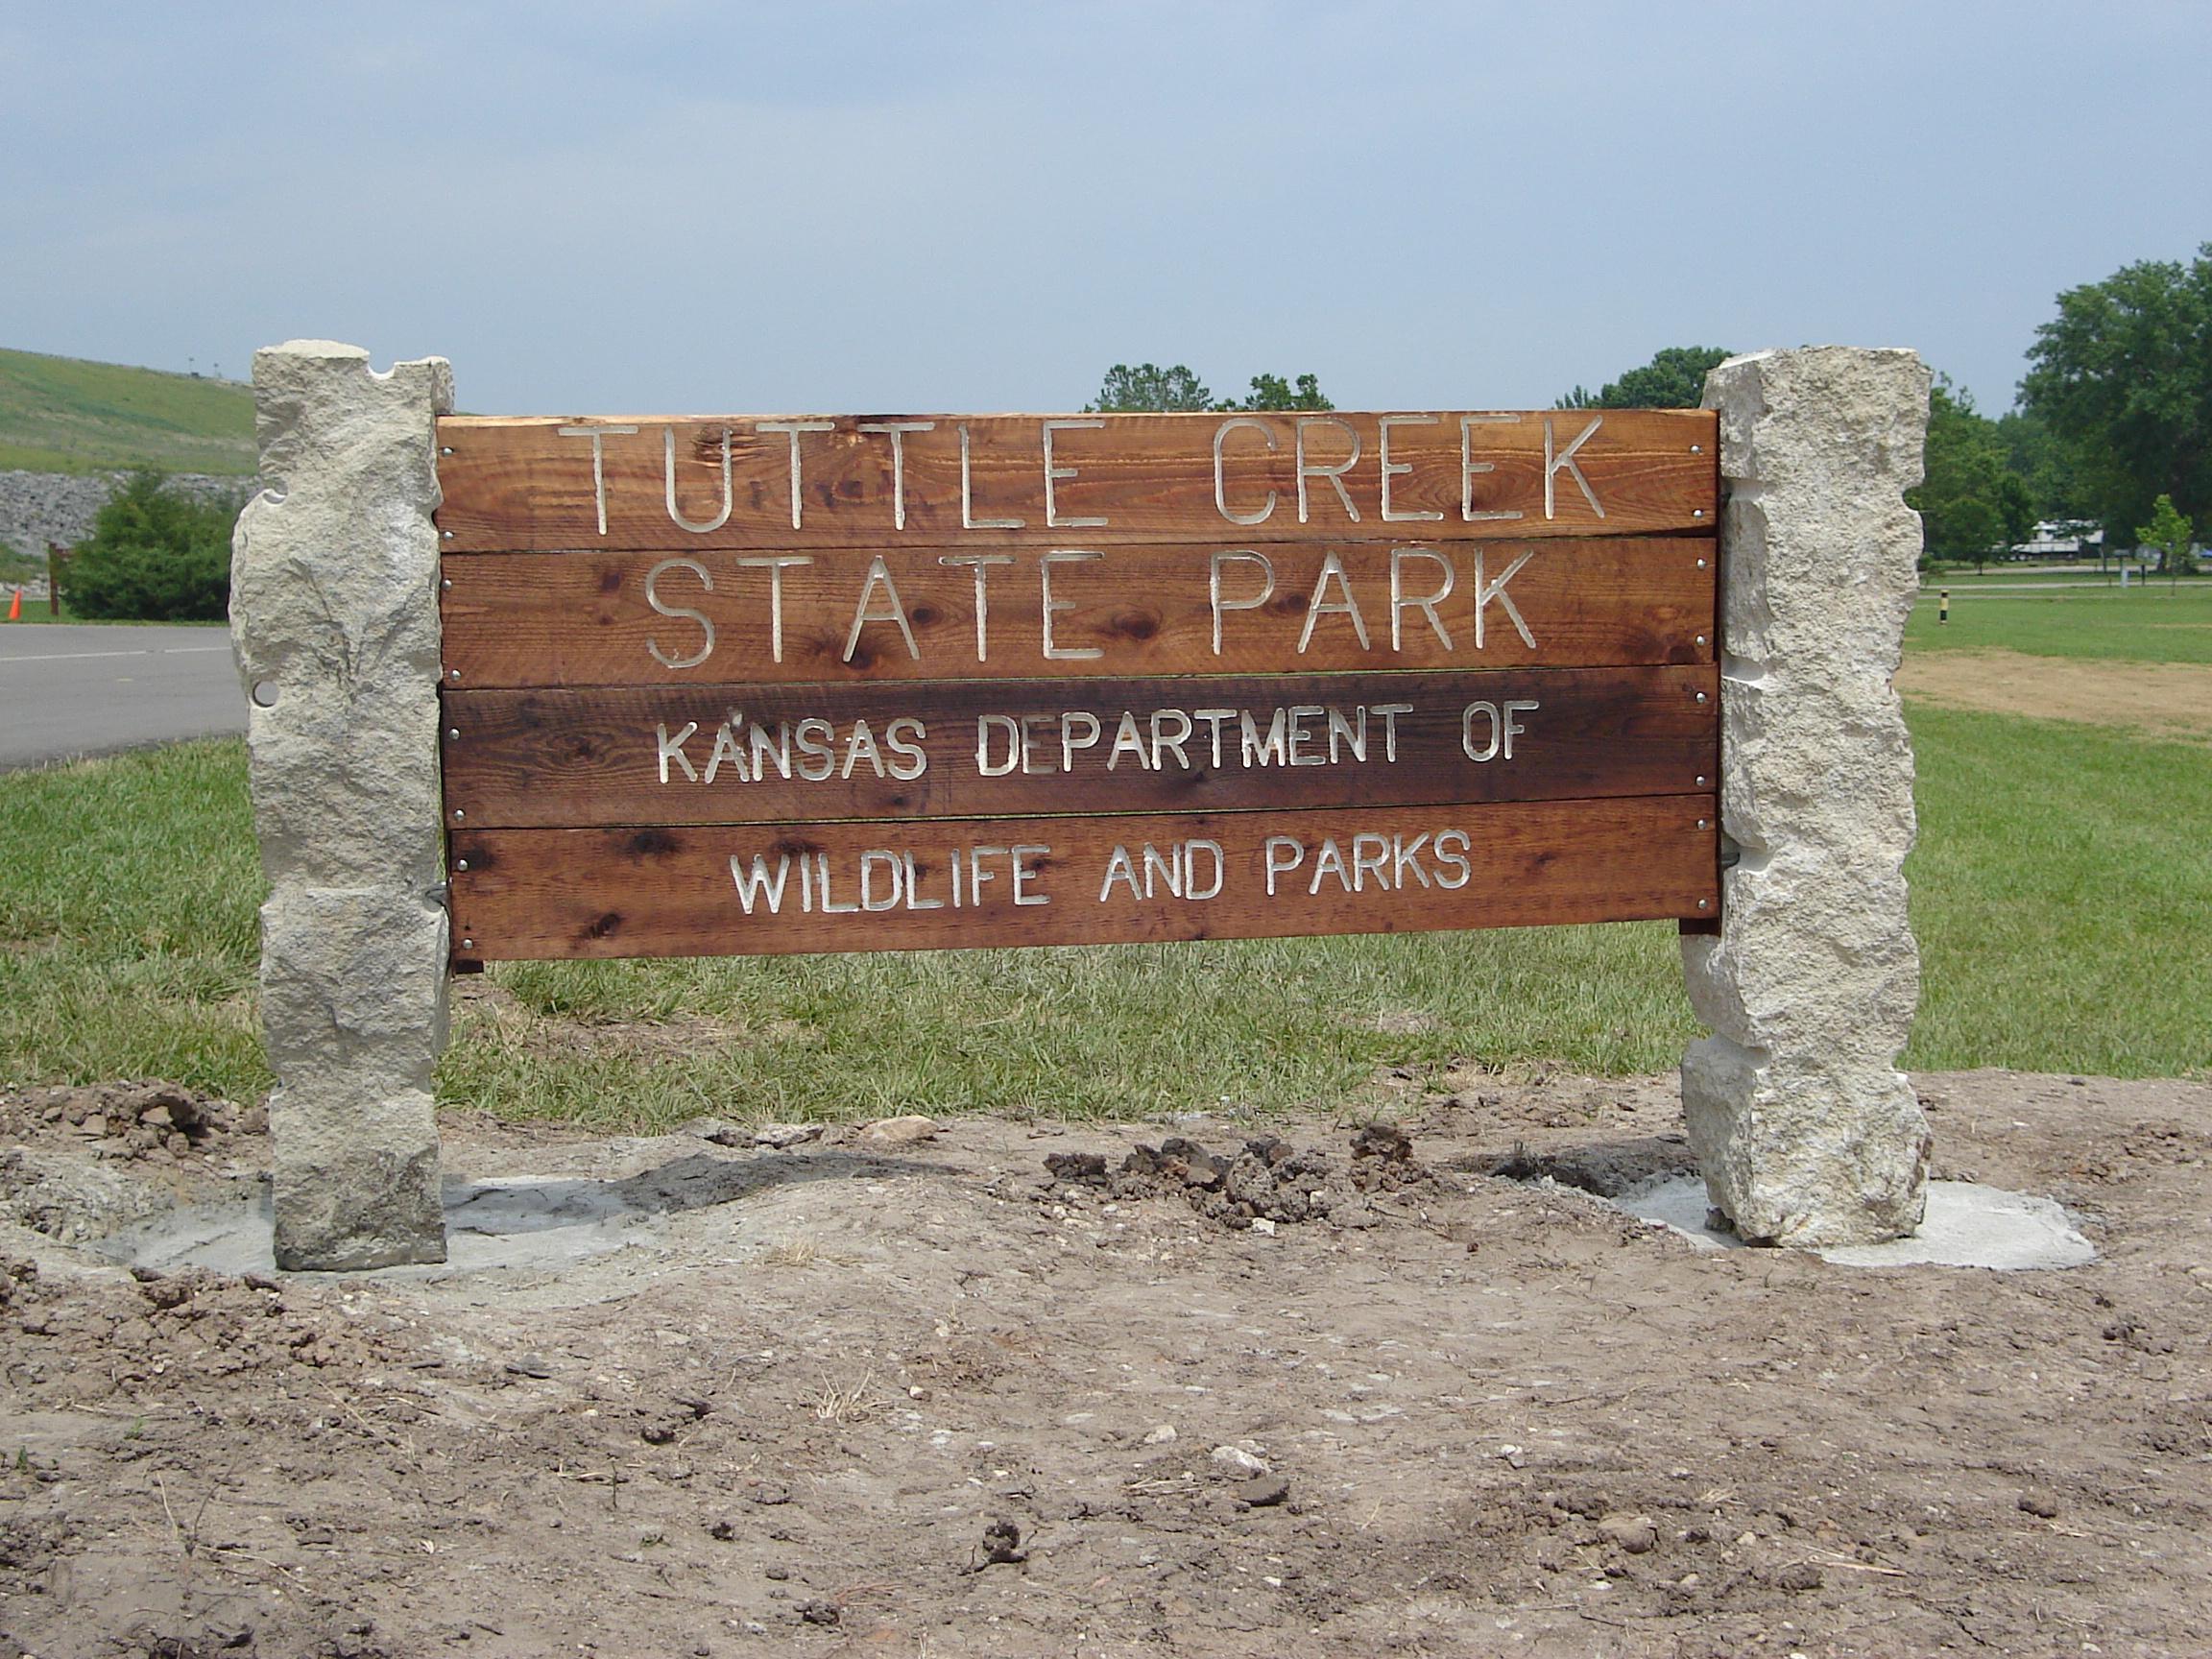 Scott City Ks >> Tuttle Creek Gallery / Tuttle Creek / Locations / State Parks / KDWPT - KDWPT